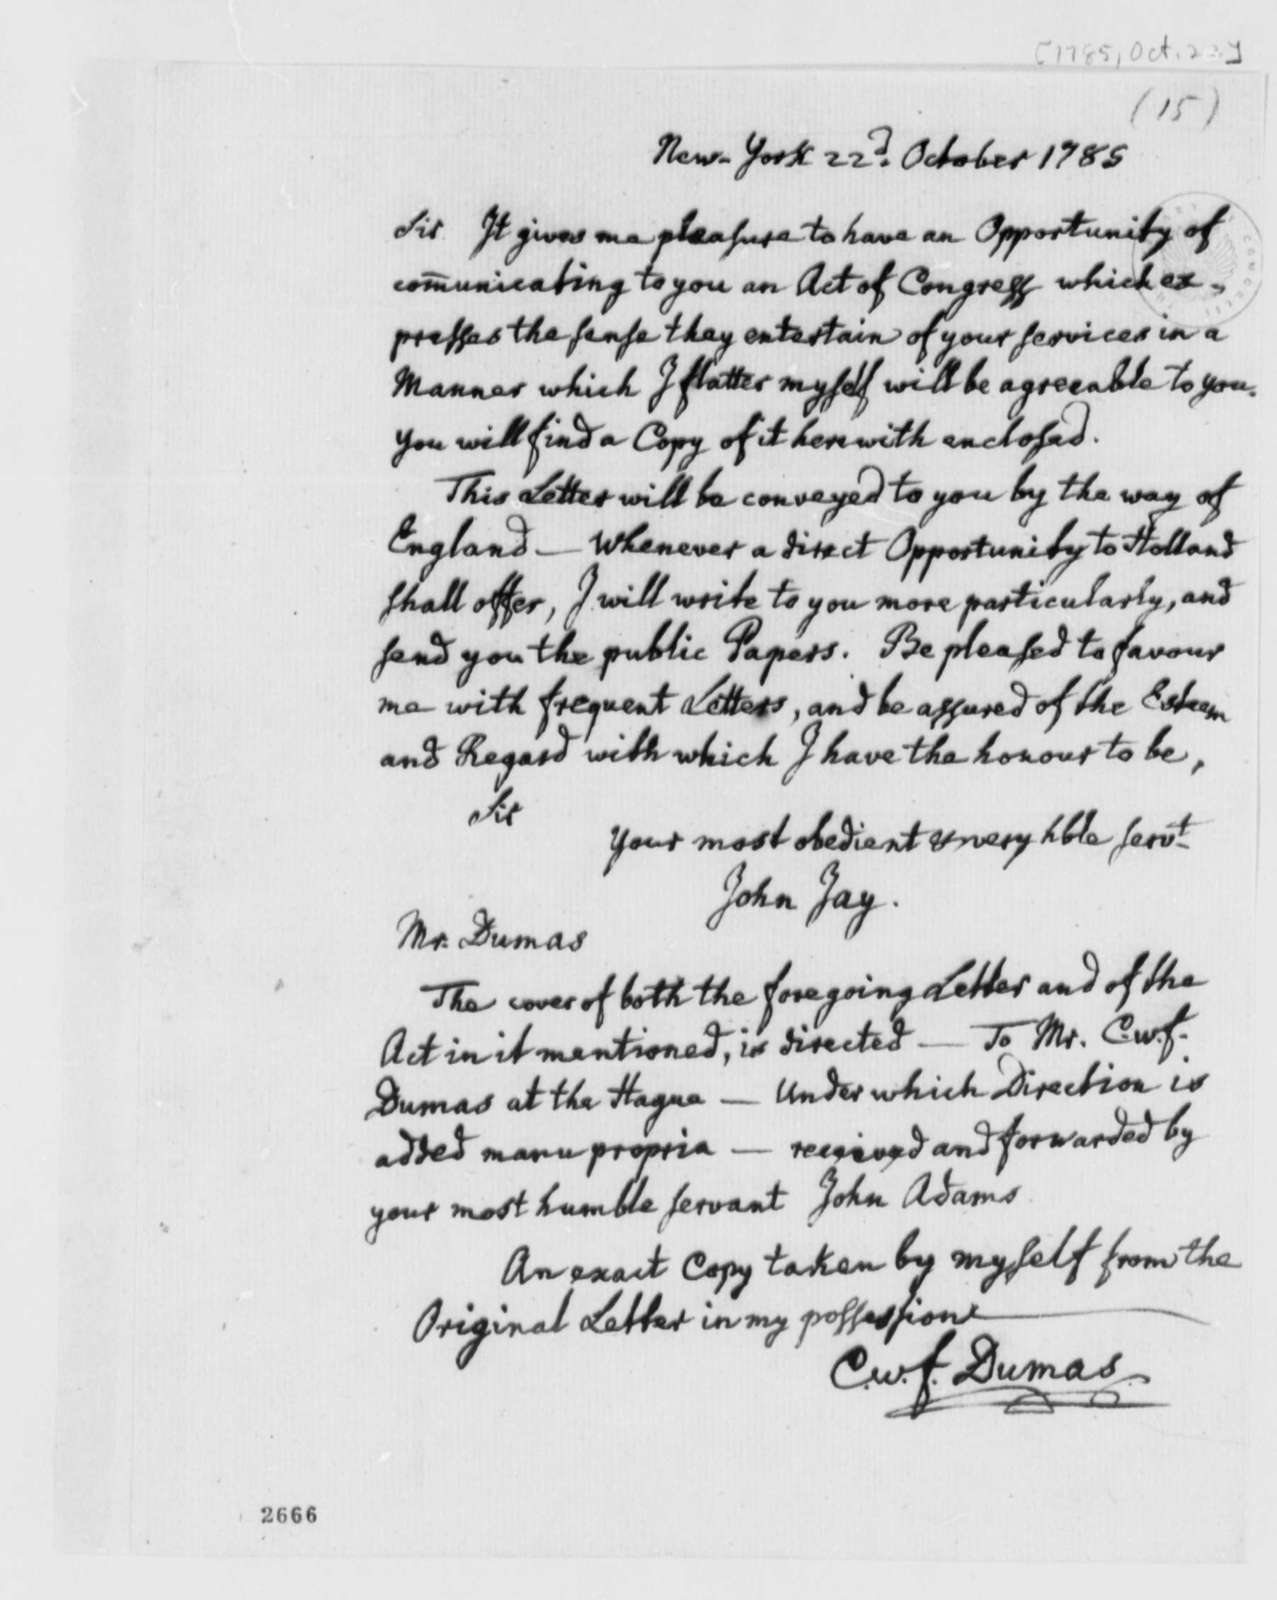 Charles William Frederic Dumas to Thomas Jefferson, October 22, 1785